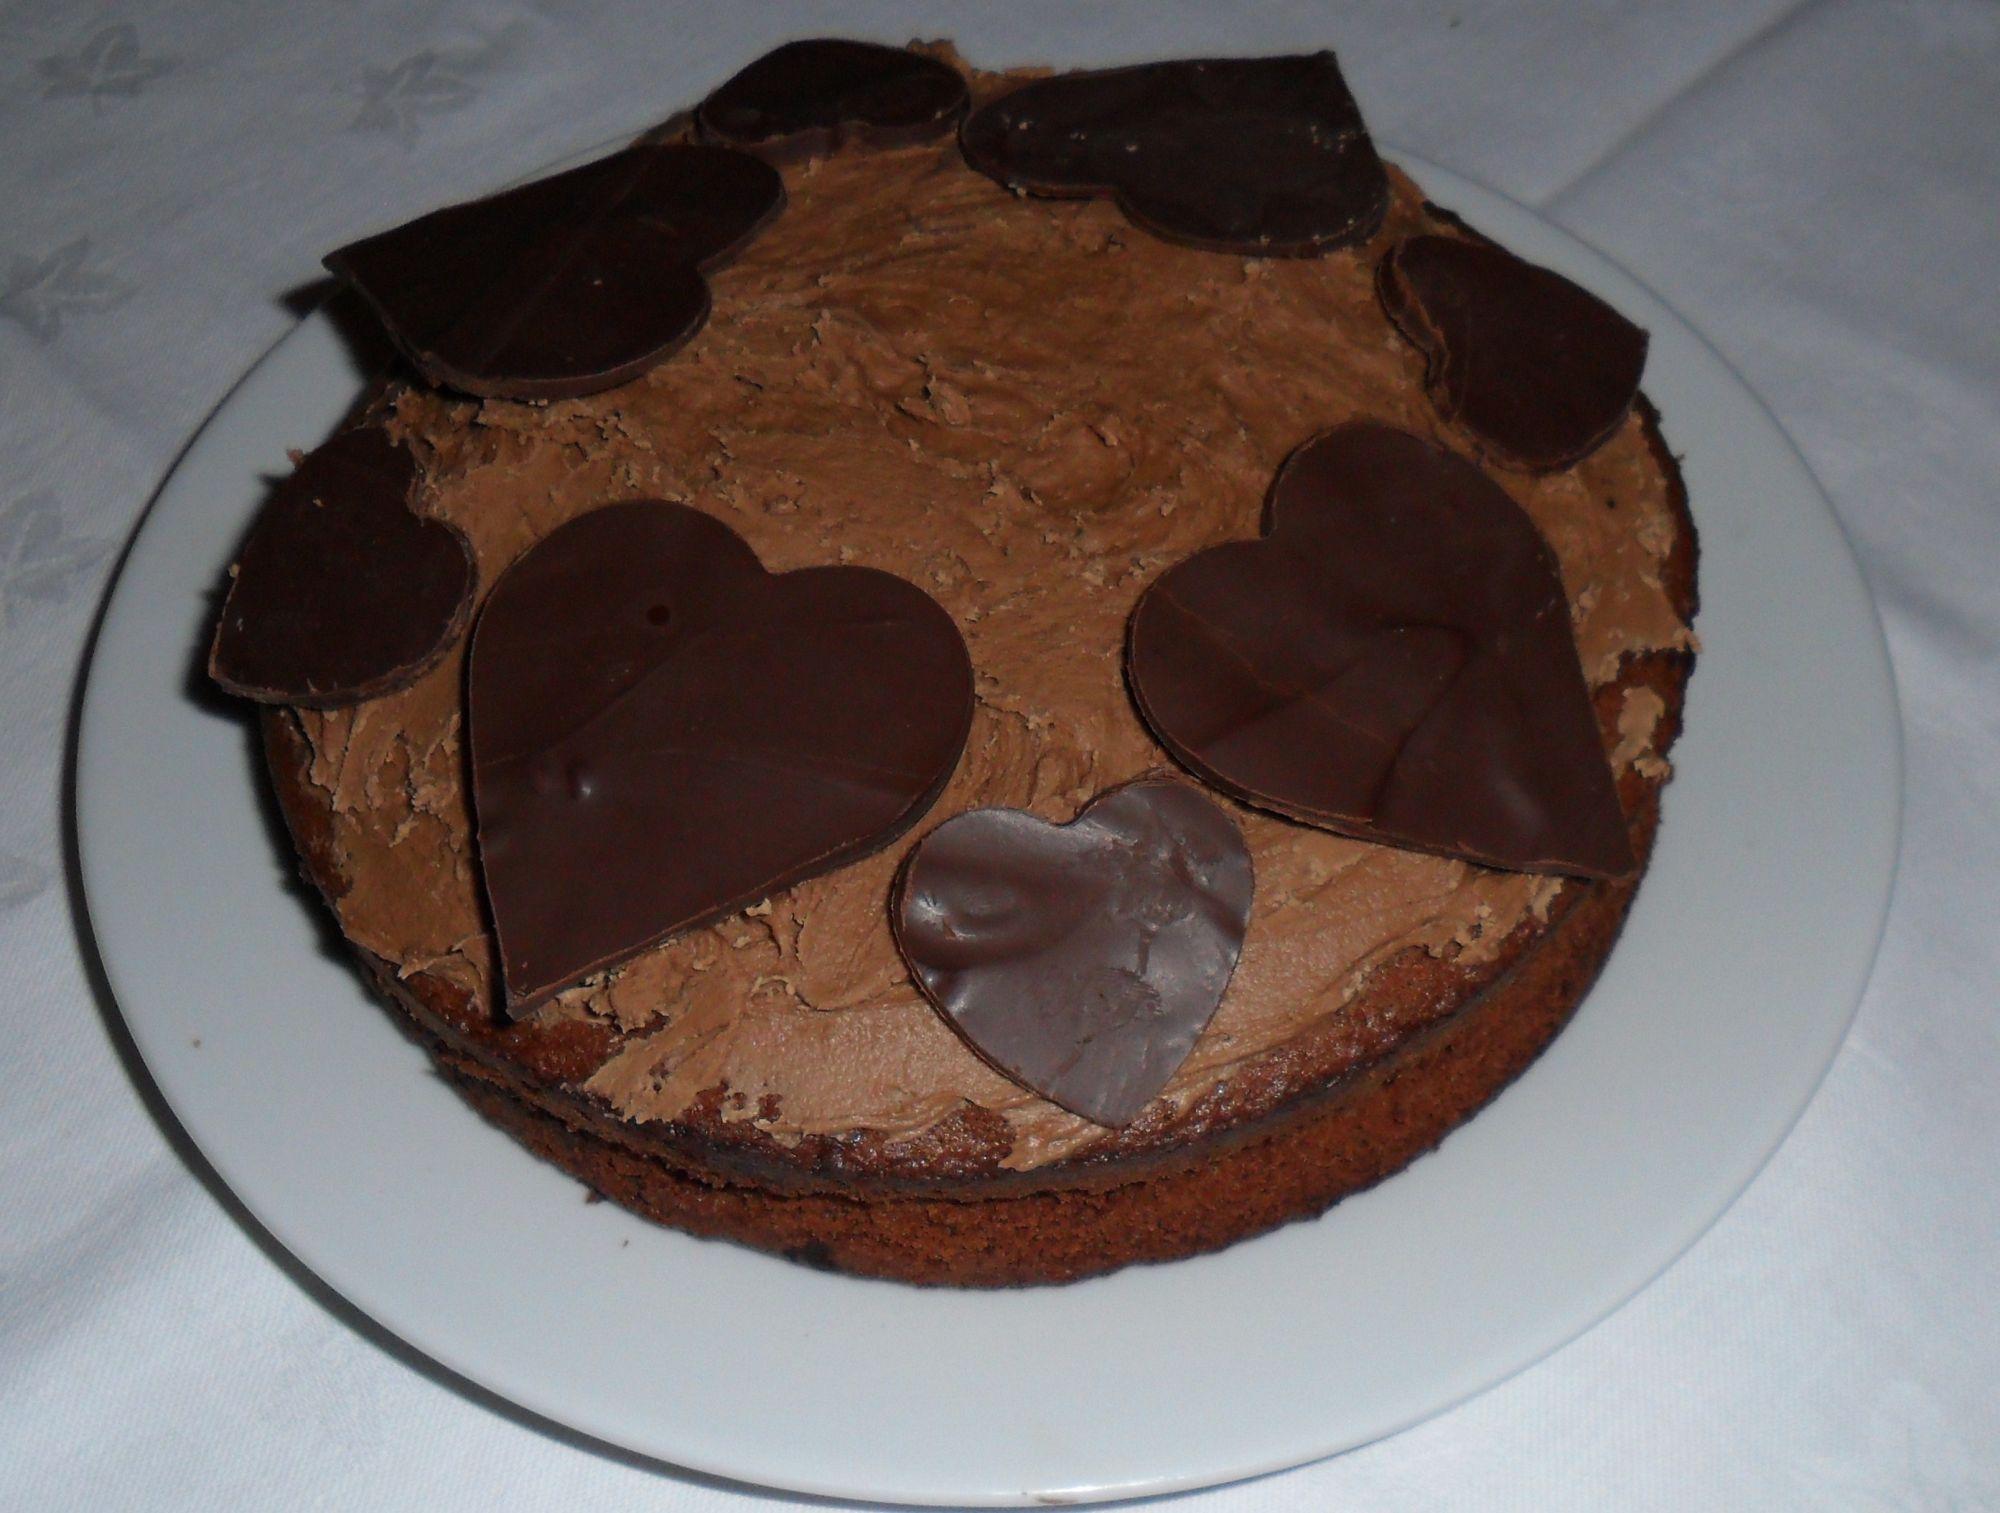 Best Sponge Cake Recipes Uk: Chocolate Sponge Cake Recipes